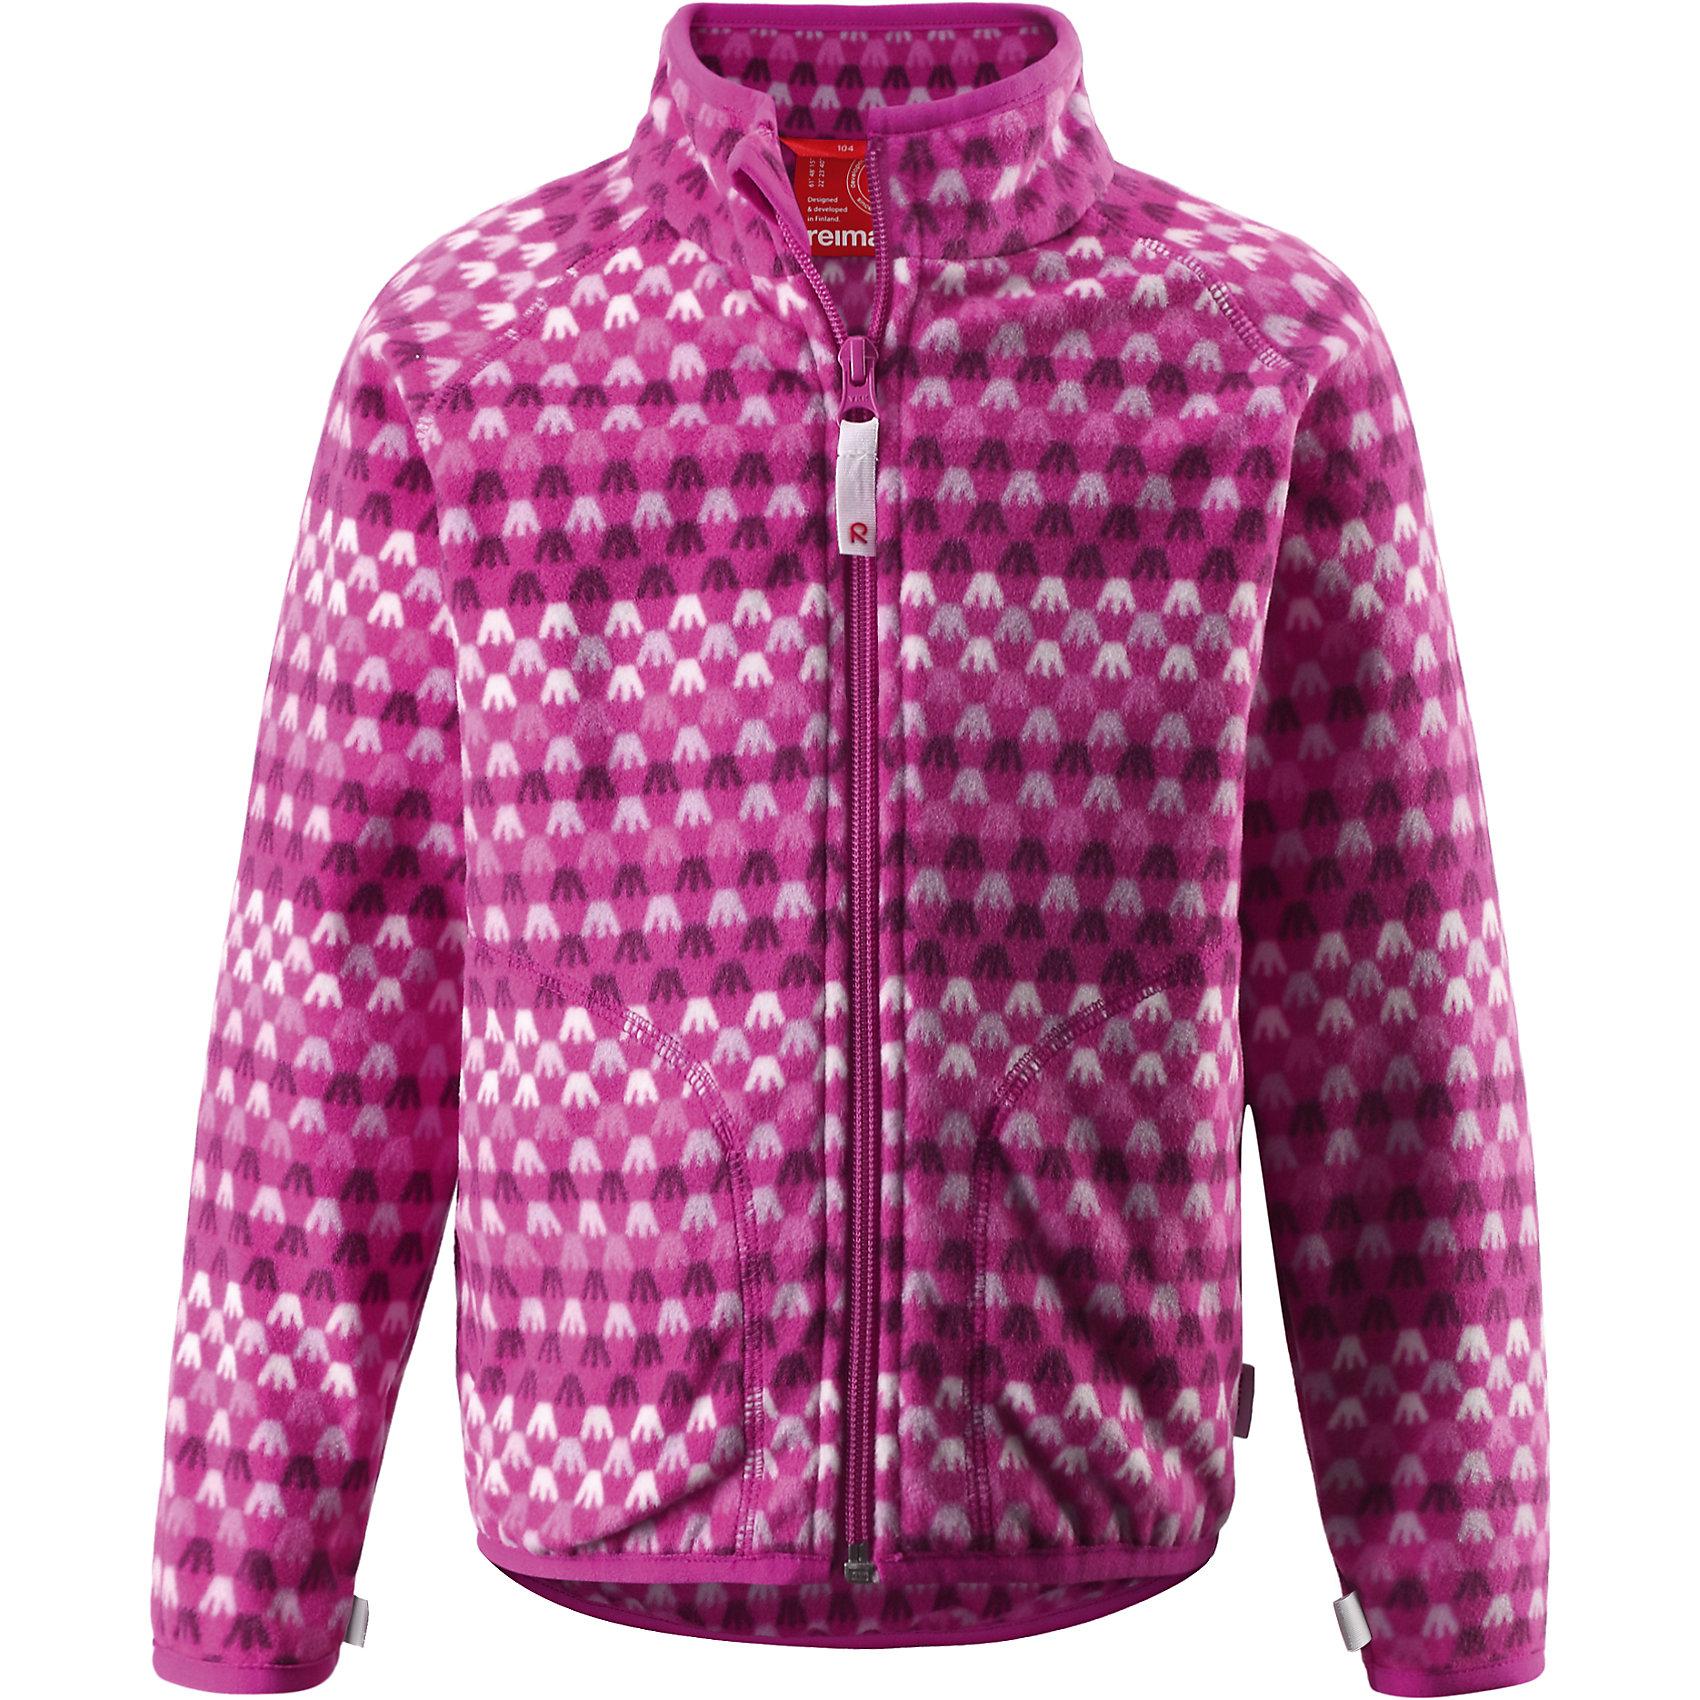 Reima Куртка флисовая Steppe для девочки Reima reima куртка флисовая steppe reima